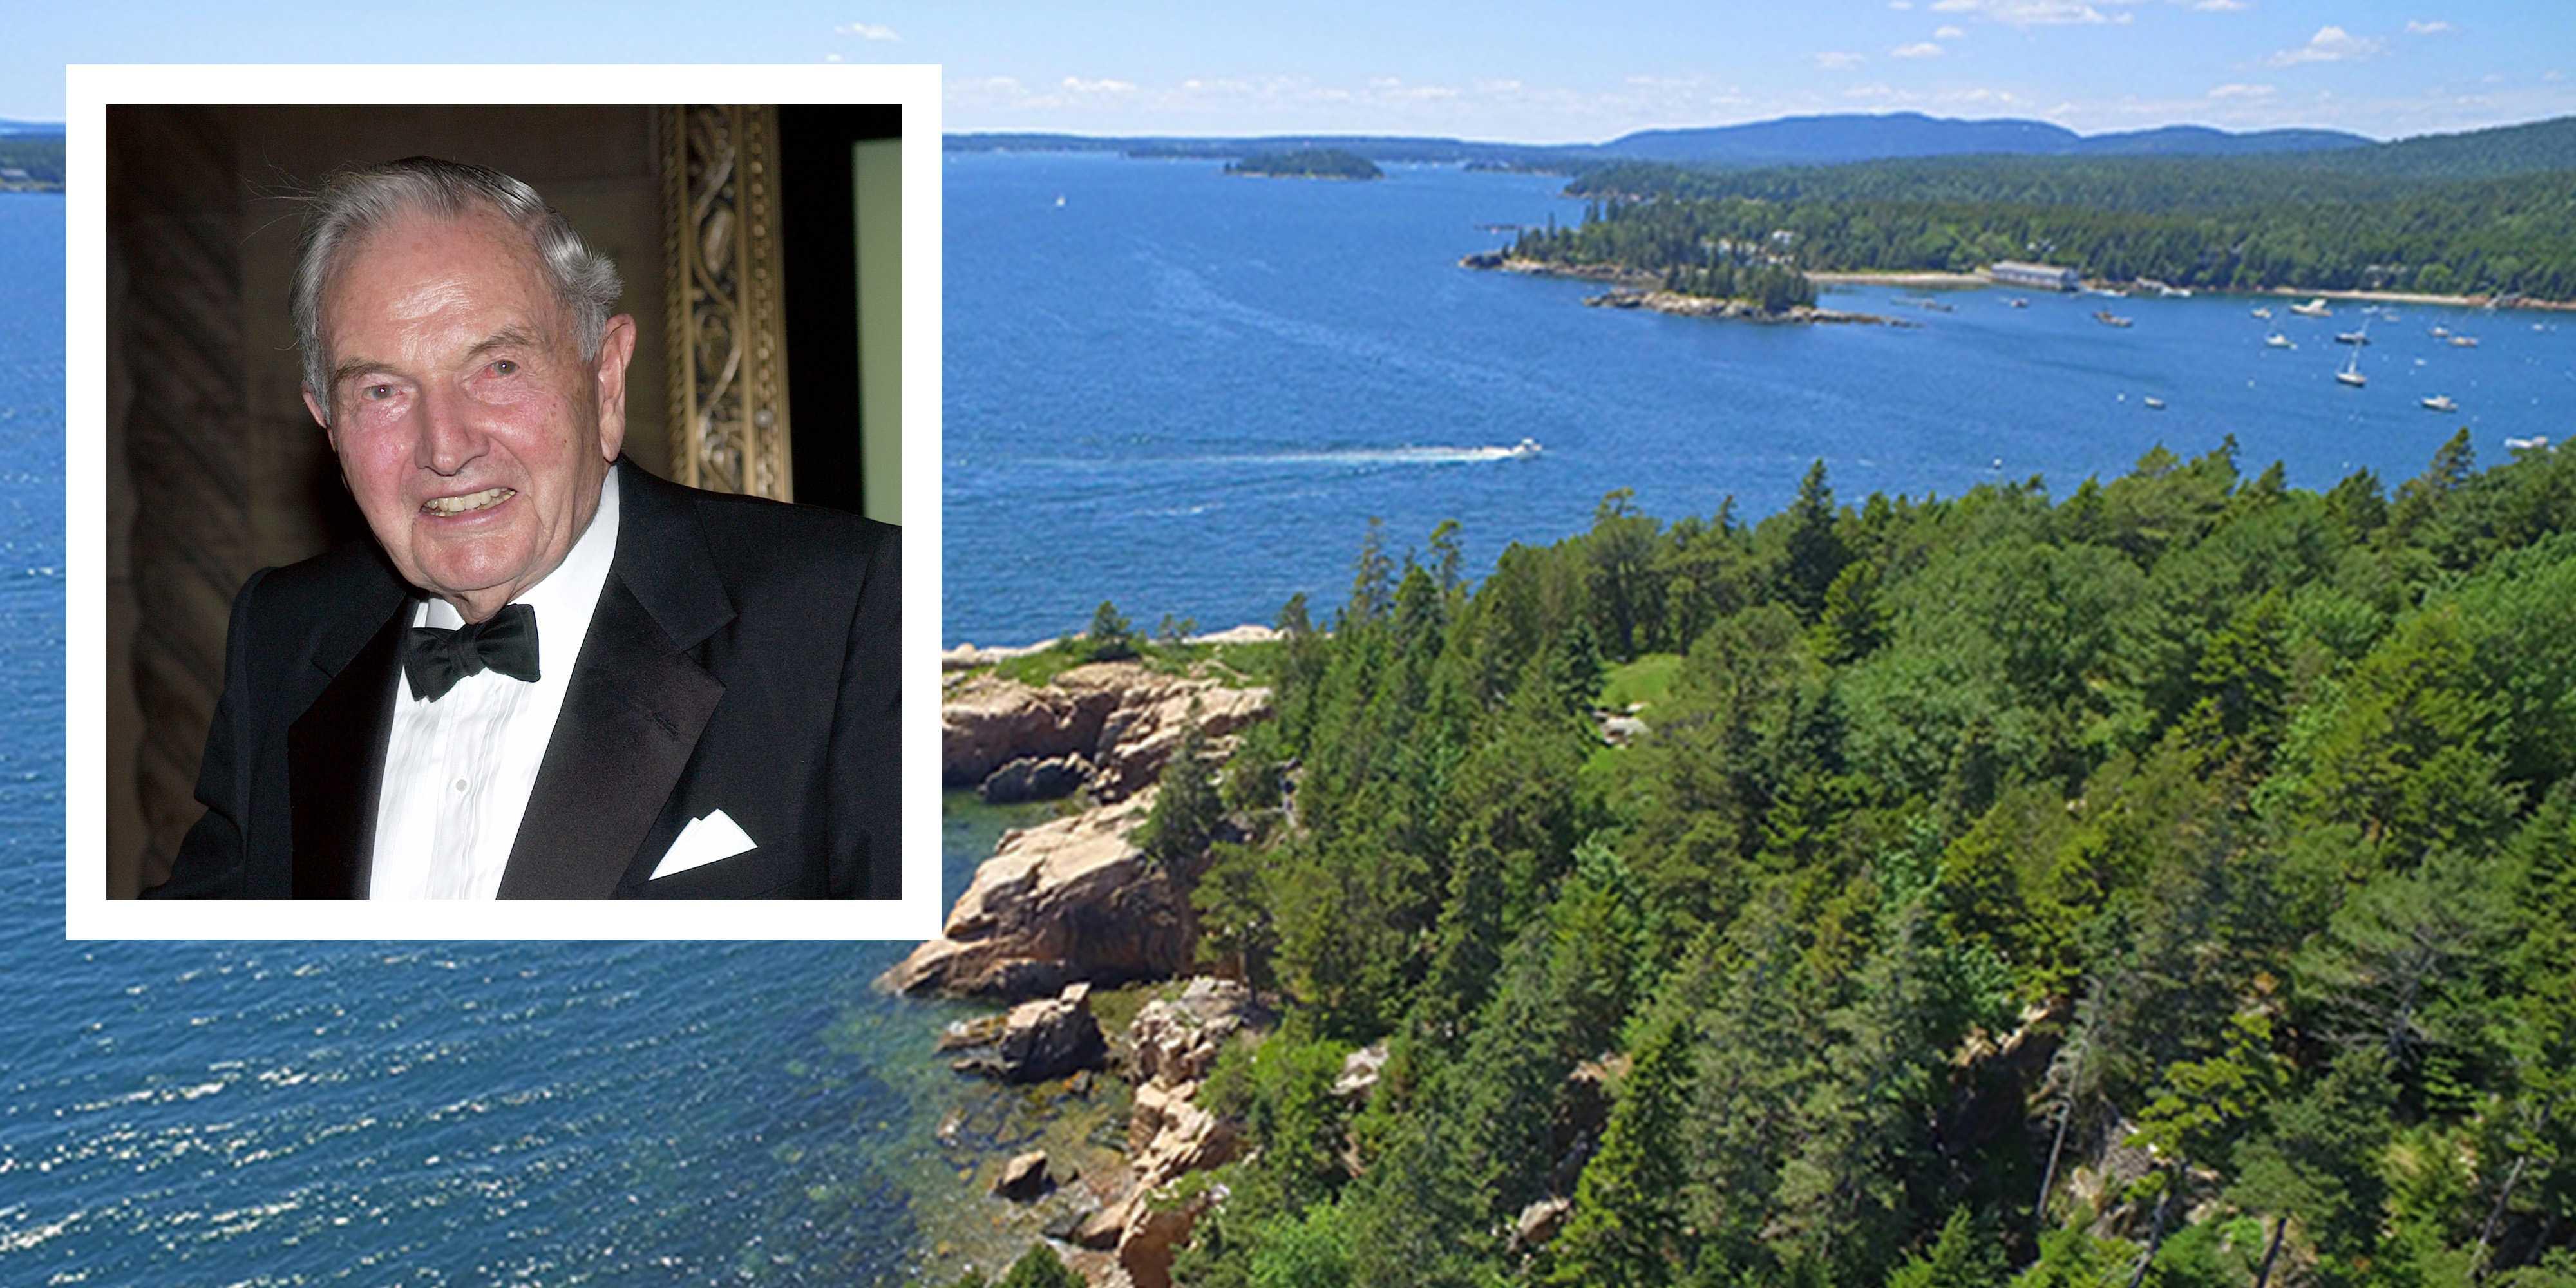 Dream House of the Week: David Rockefeller's sprawling Maine estate